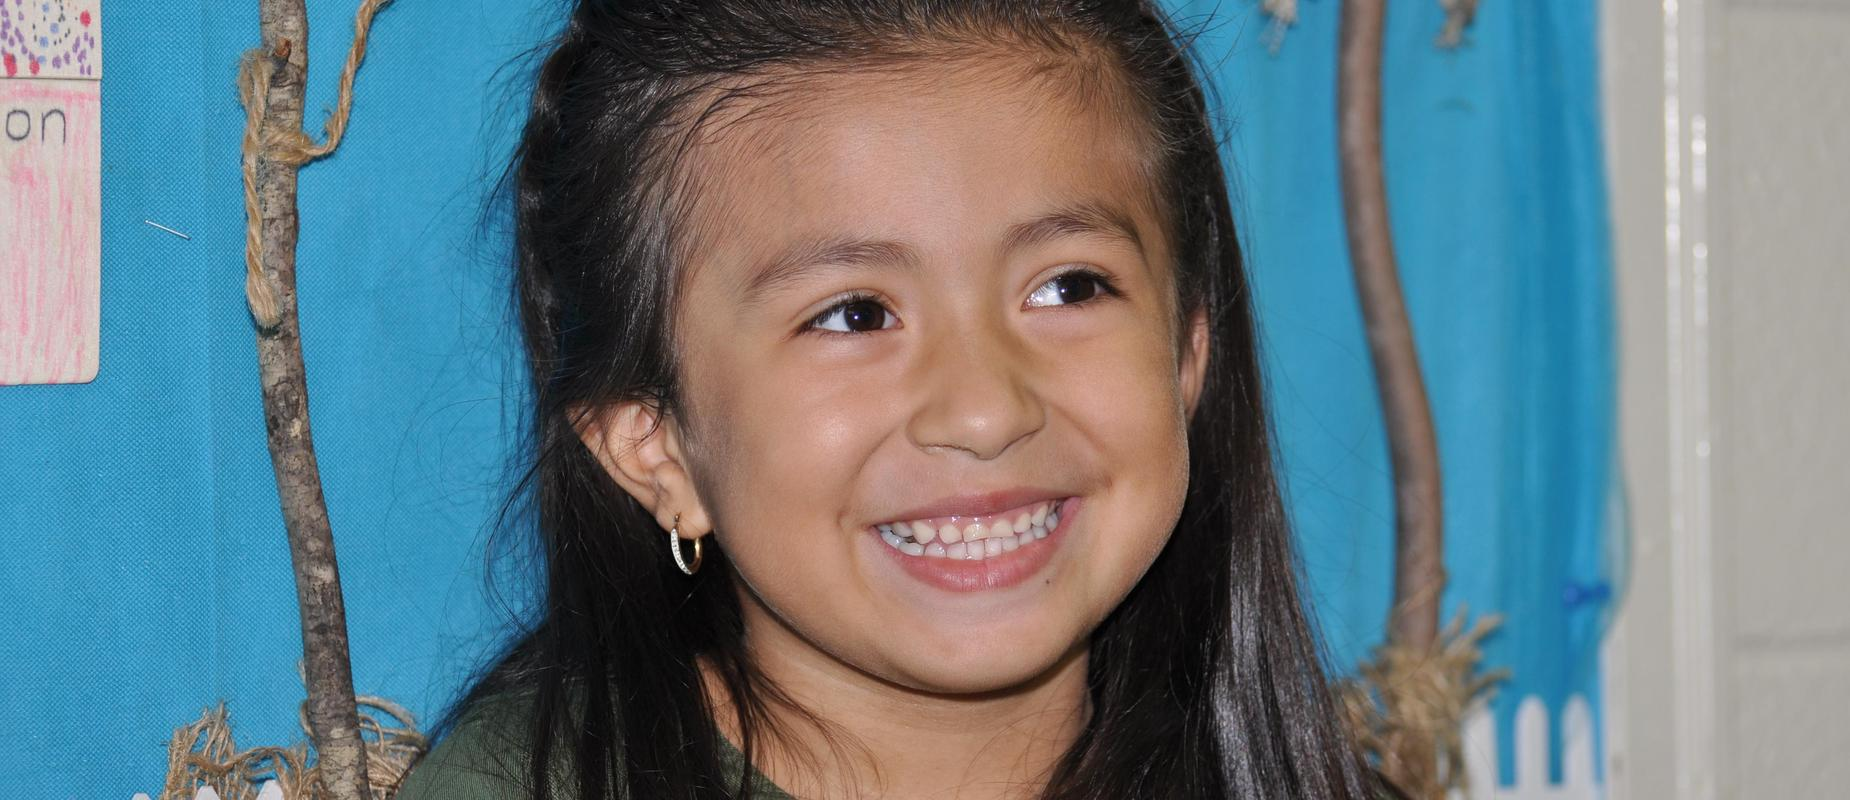 Hamilton Crossing Elementary School Student Mayah DeLoera